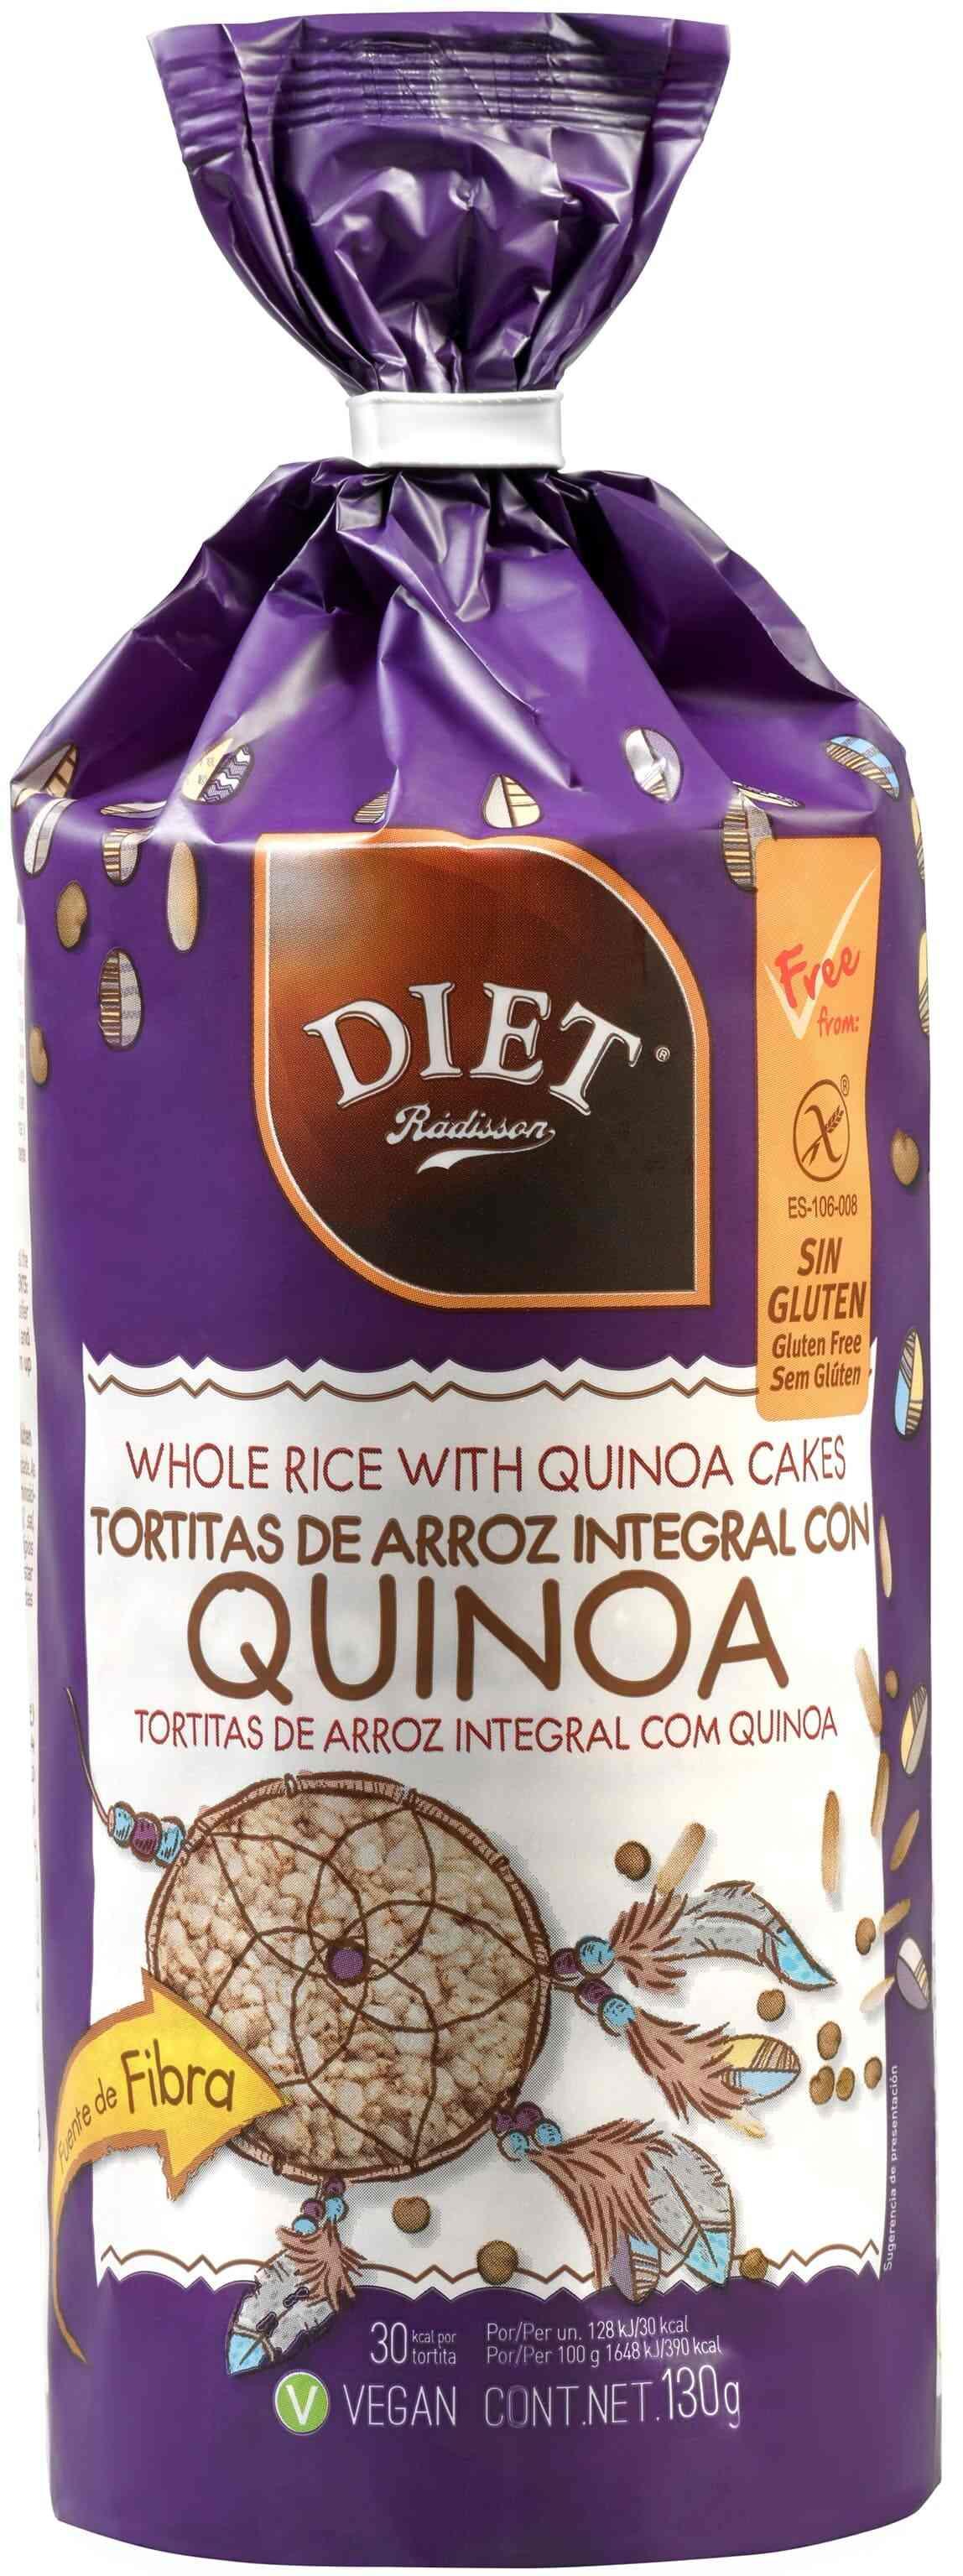 TORTITAS DE ARROZ  Y QUINOA SIN GLUTEN 130 GR DIET RADISSON en Biovegalia